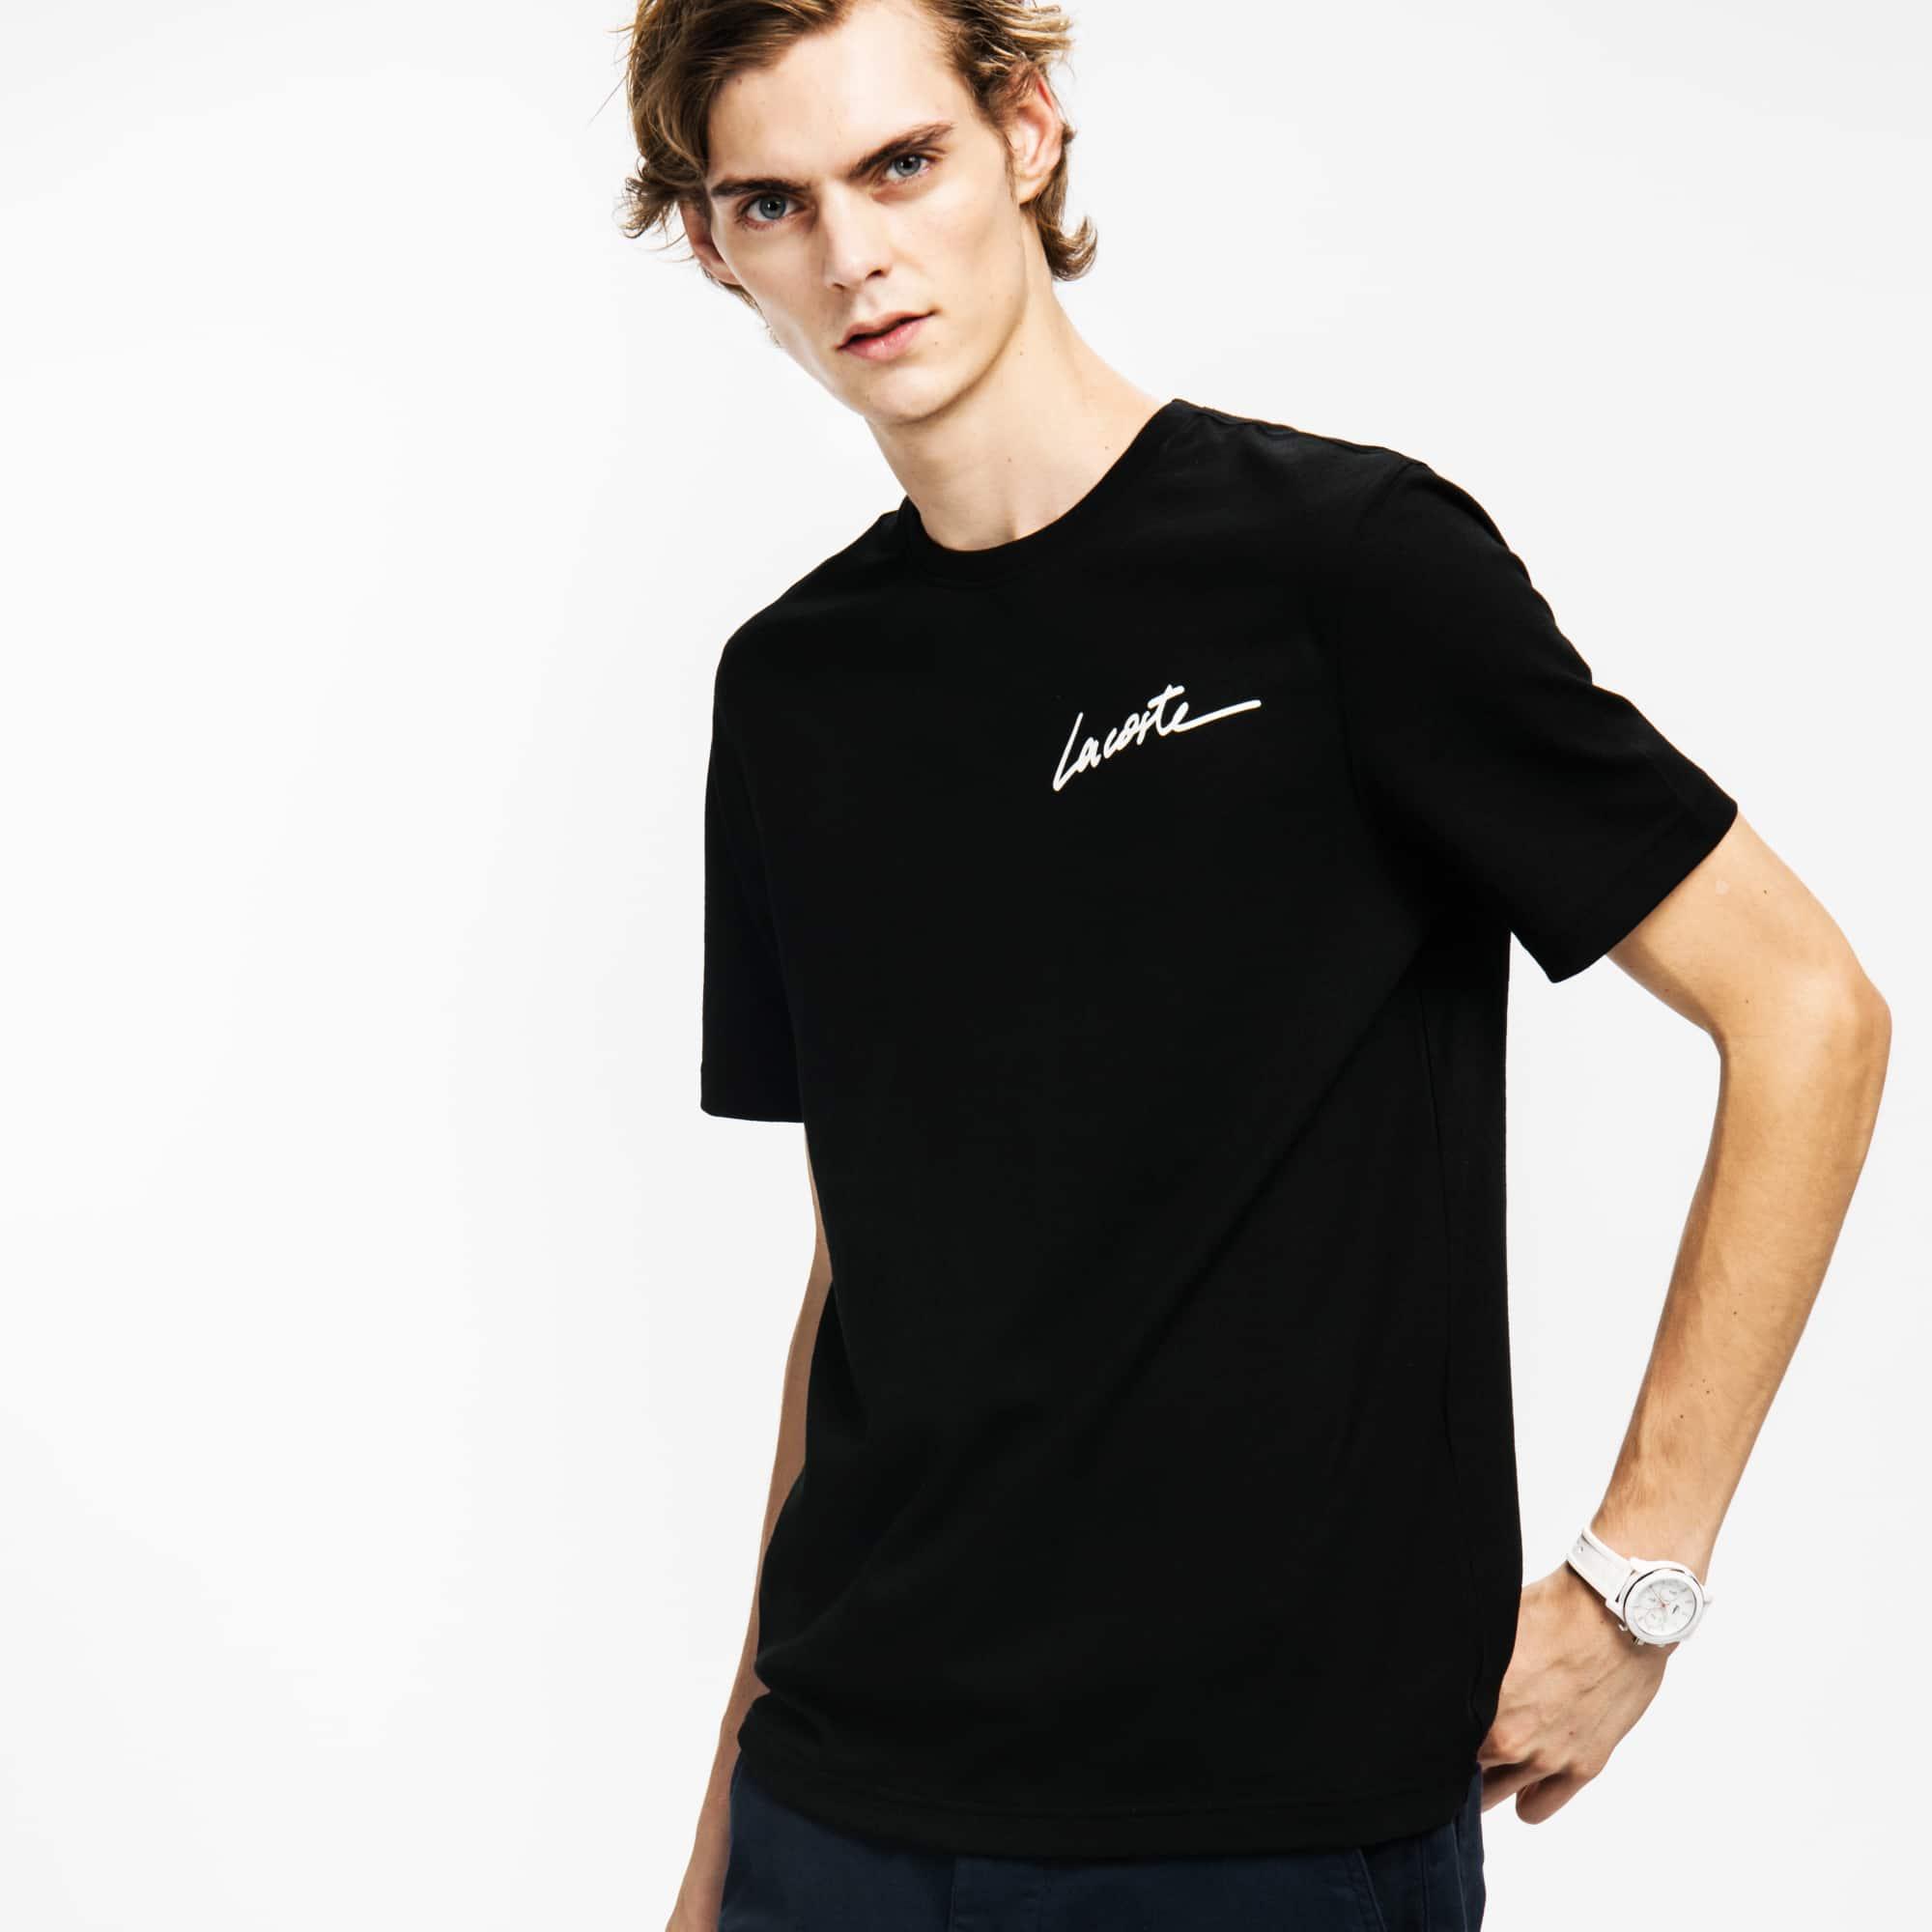 Lacoste LIVE男士圆领Lacoste标志性平纹单面针织T恤